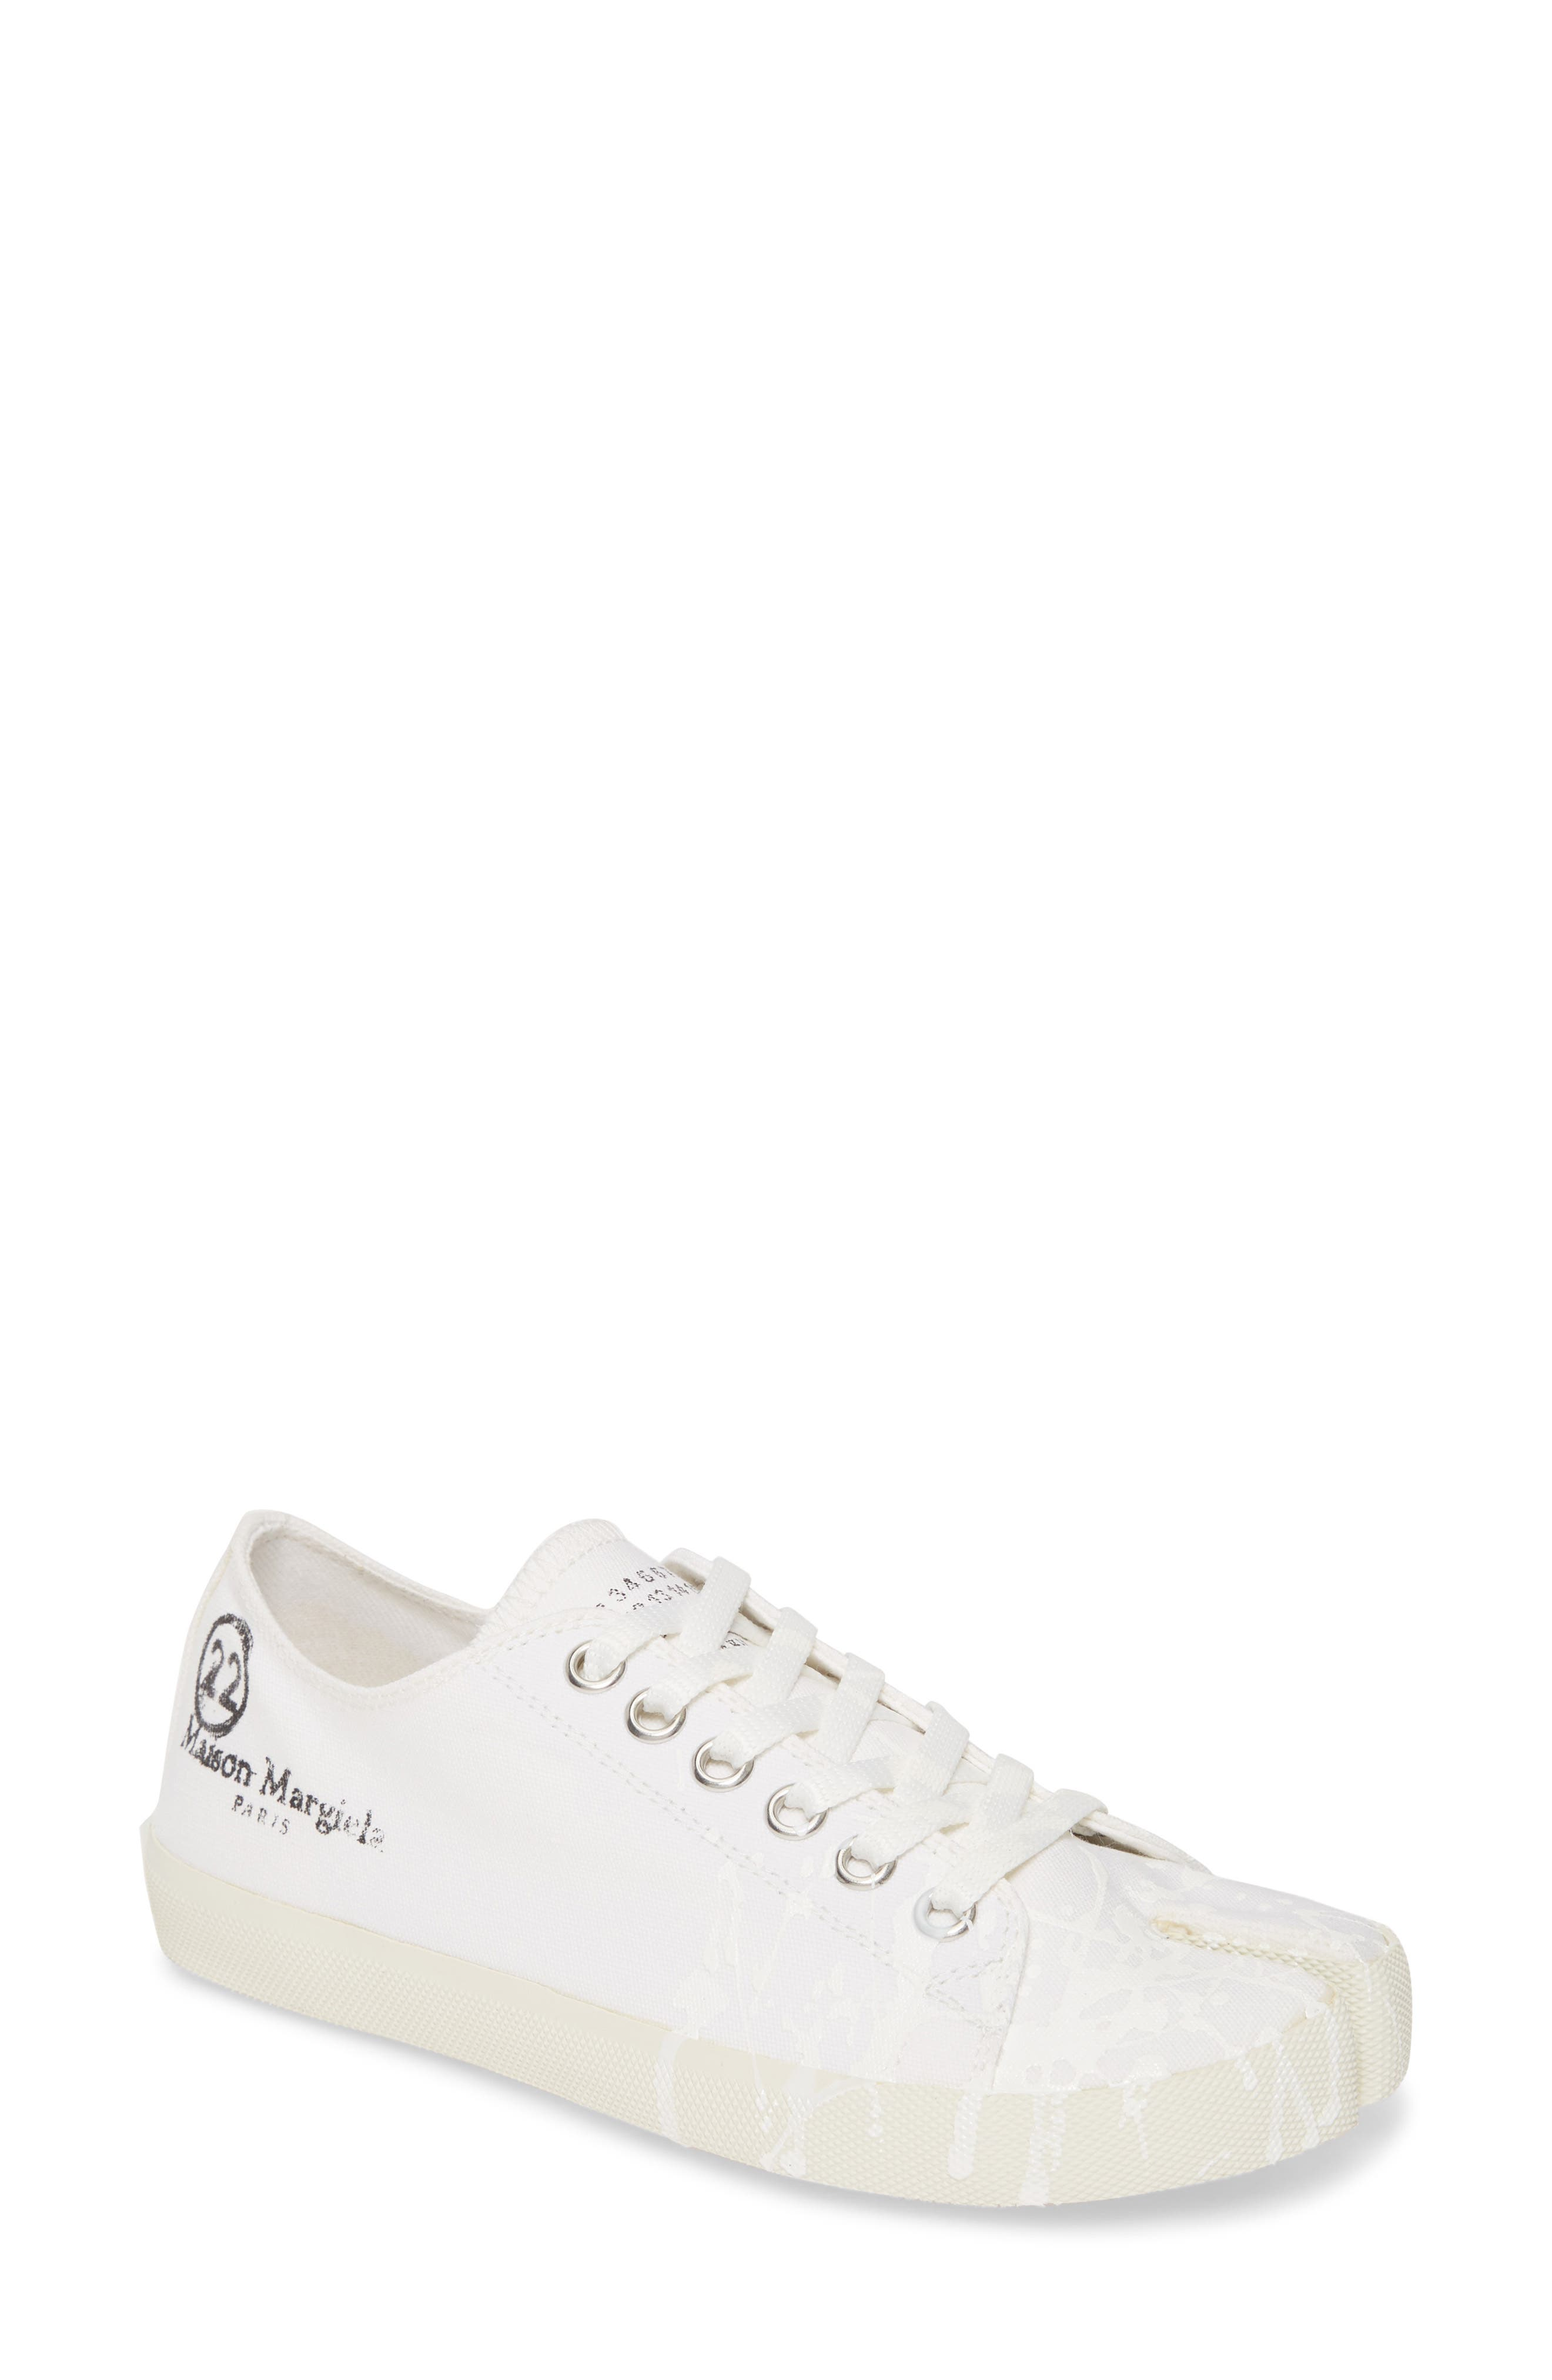 Women's White Maison Margiela Shoes